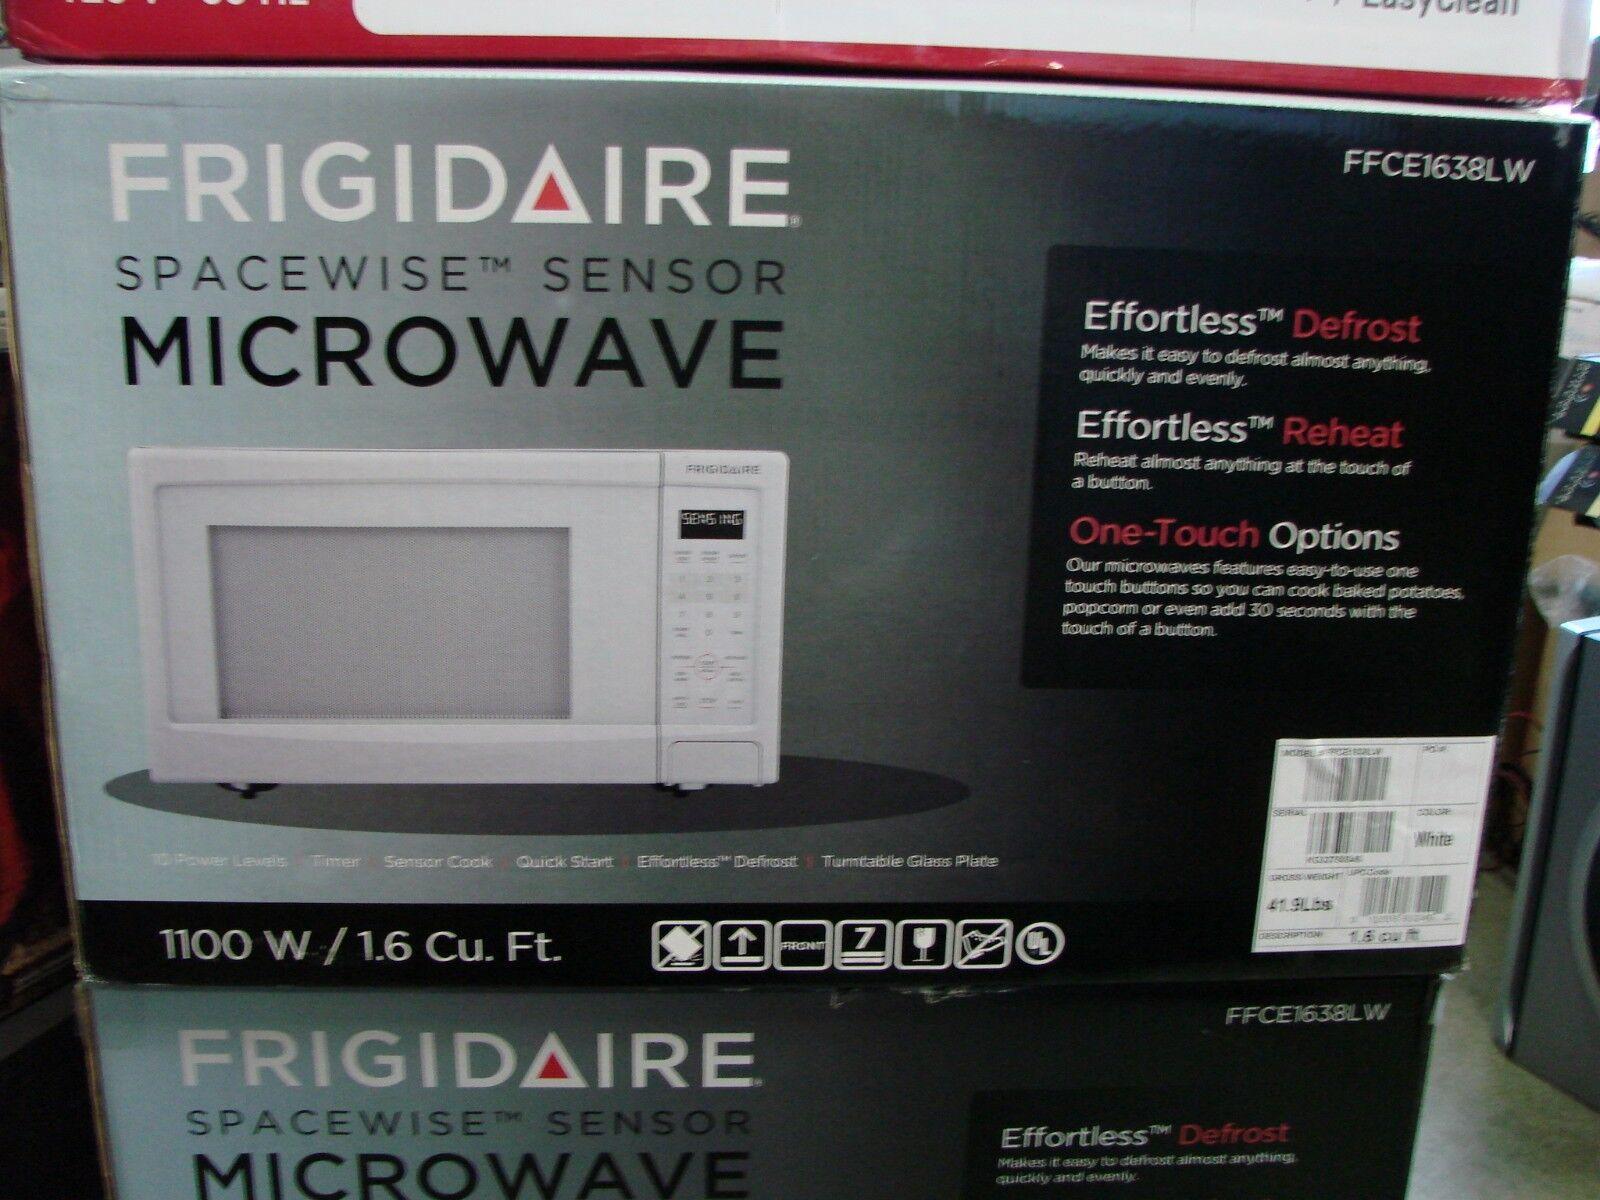 Frigidaire FFCE1638LW 1100-watt Countertop Microwave, 1.6 Cu